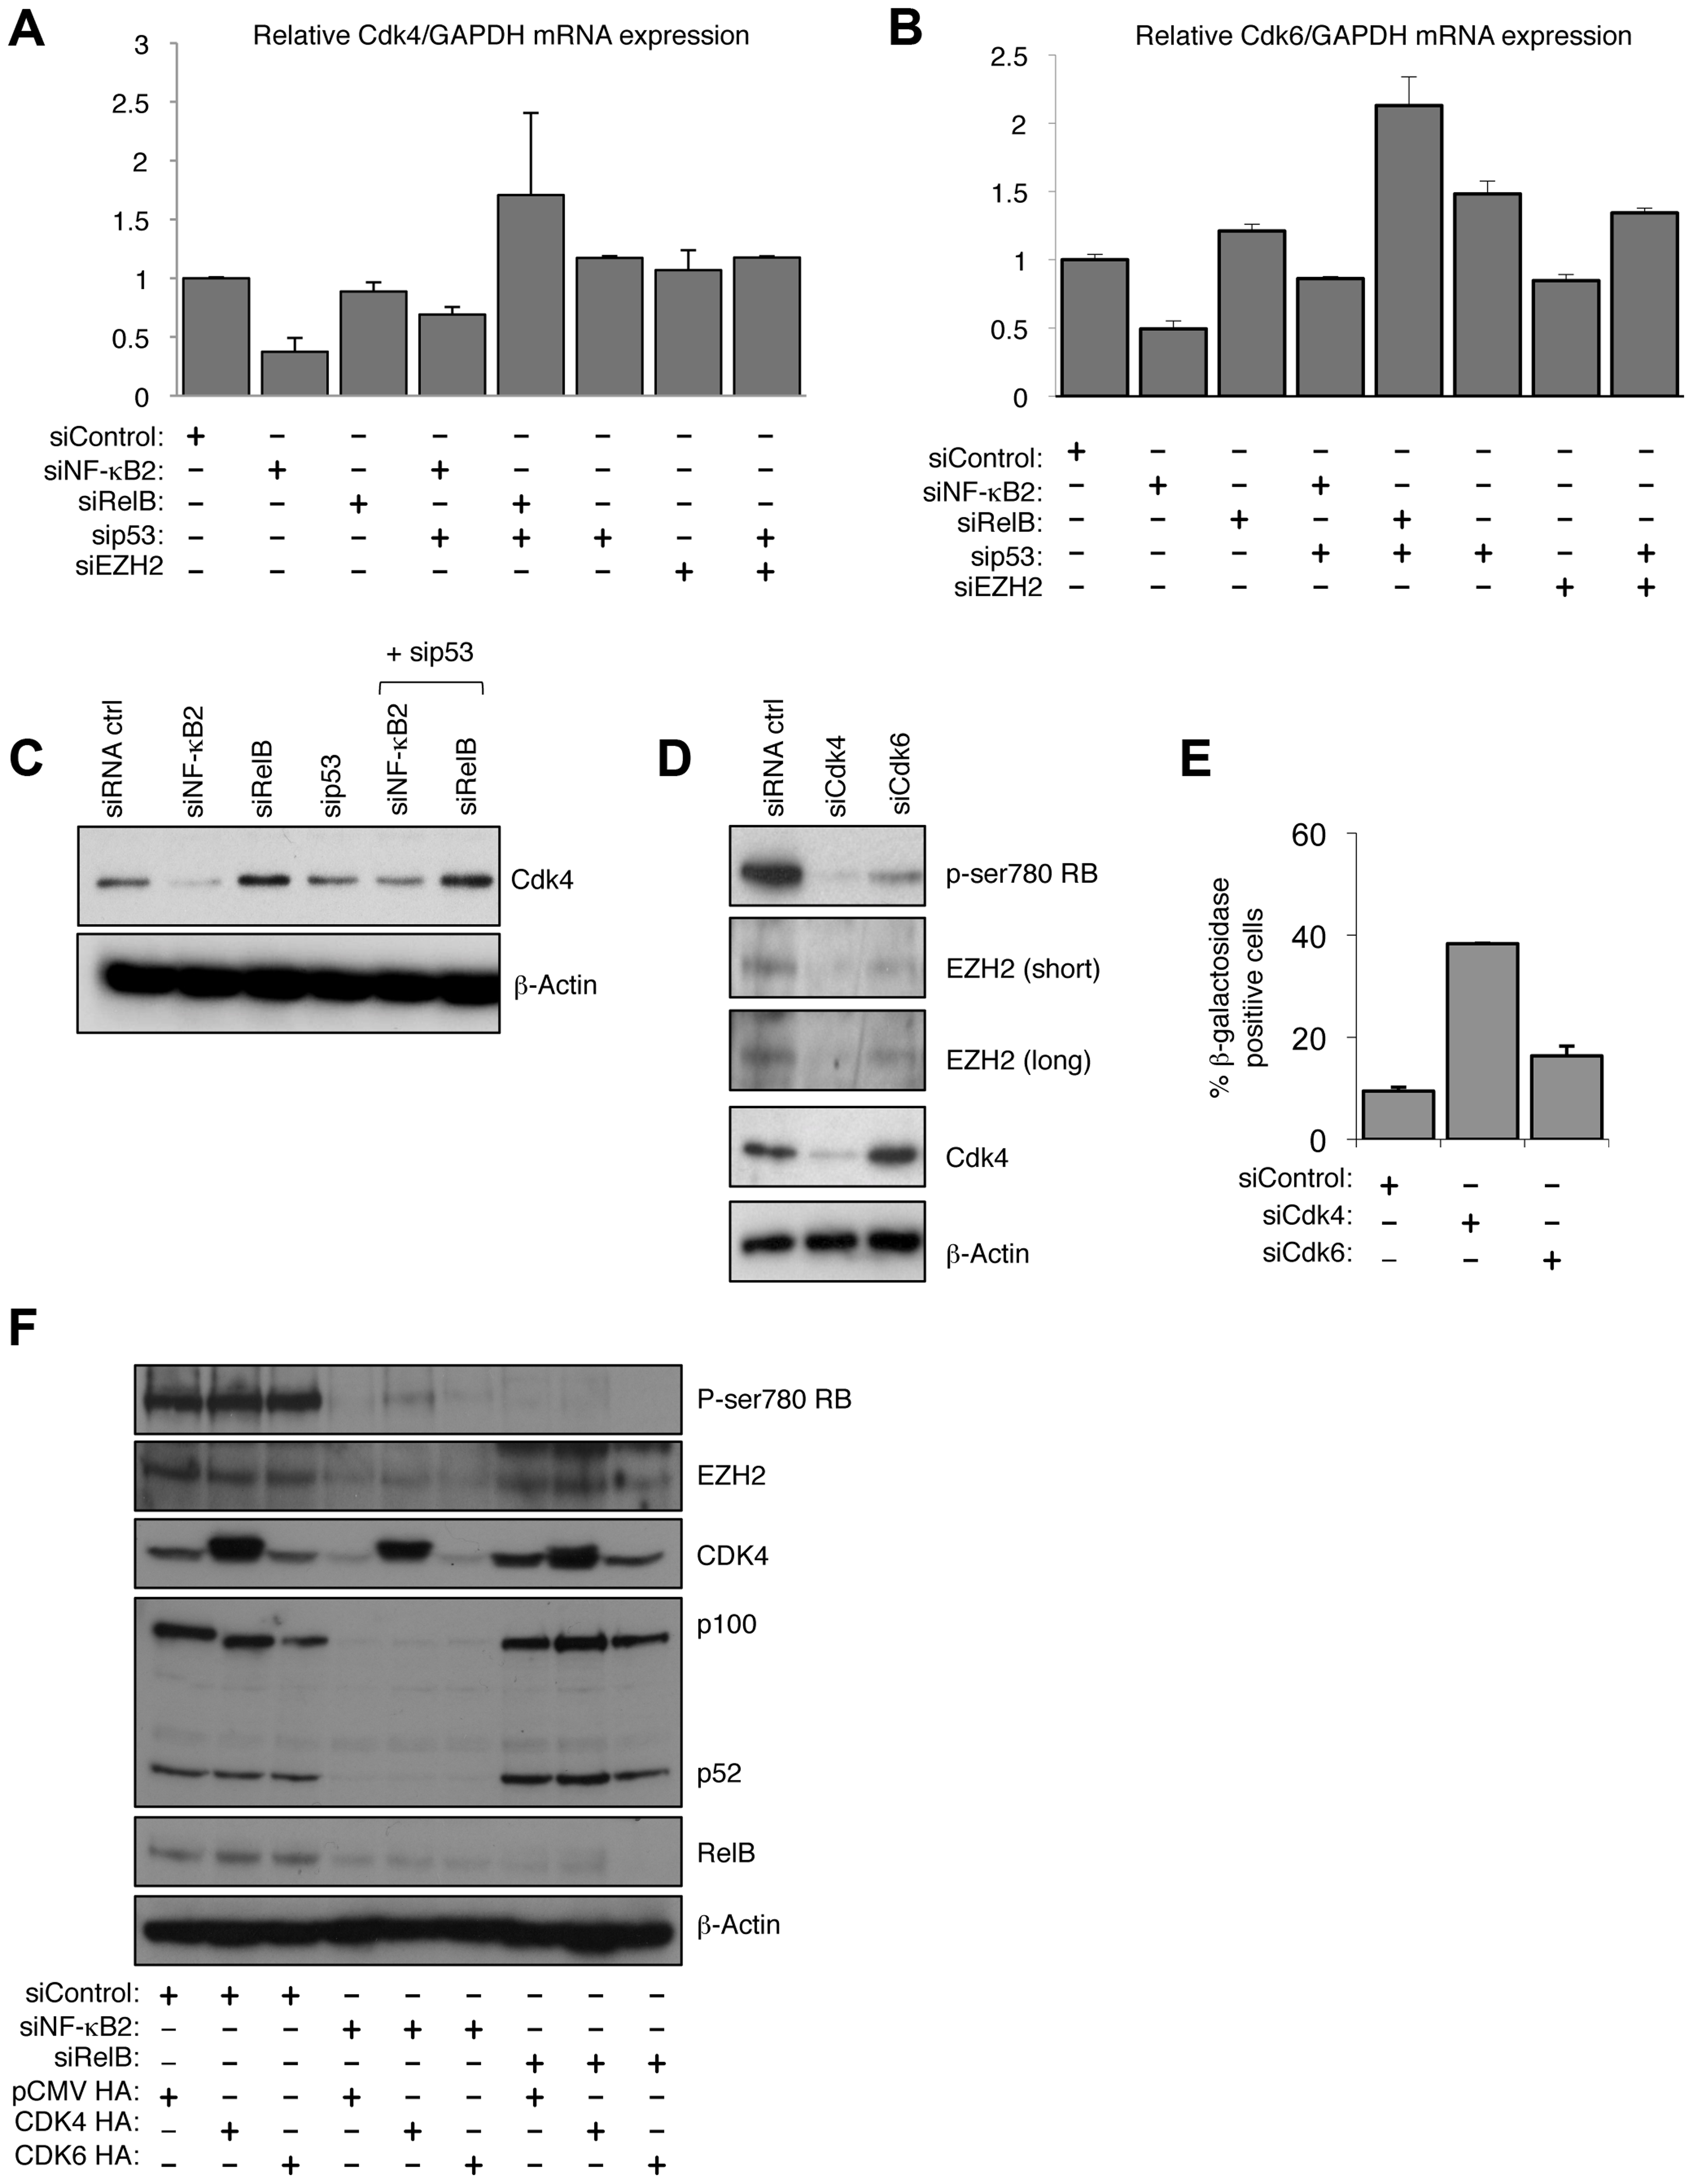 NF-κB2 controls Rb phosphorylation, EZH2 expression and senescence through CDK4 and CDK6 regulation.